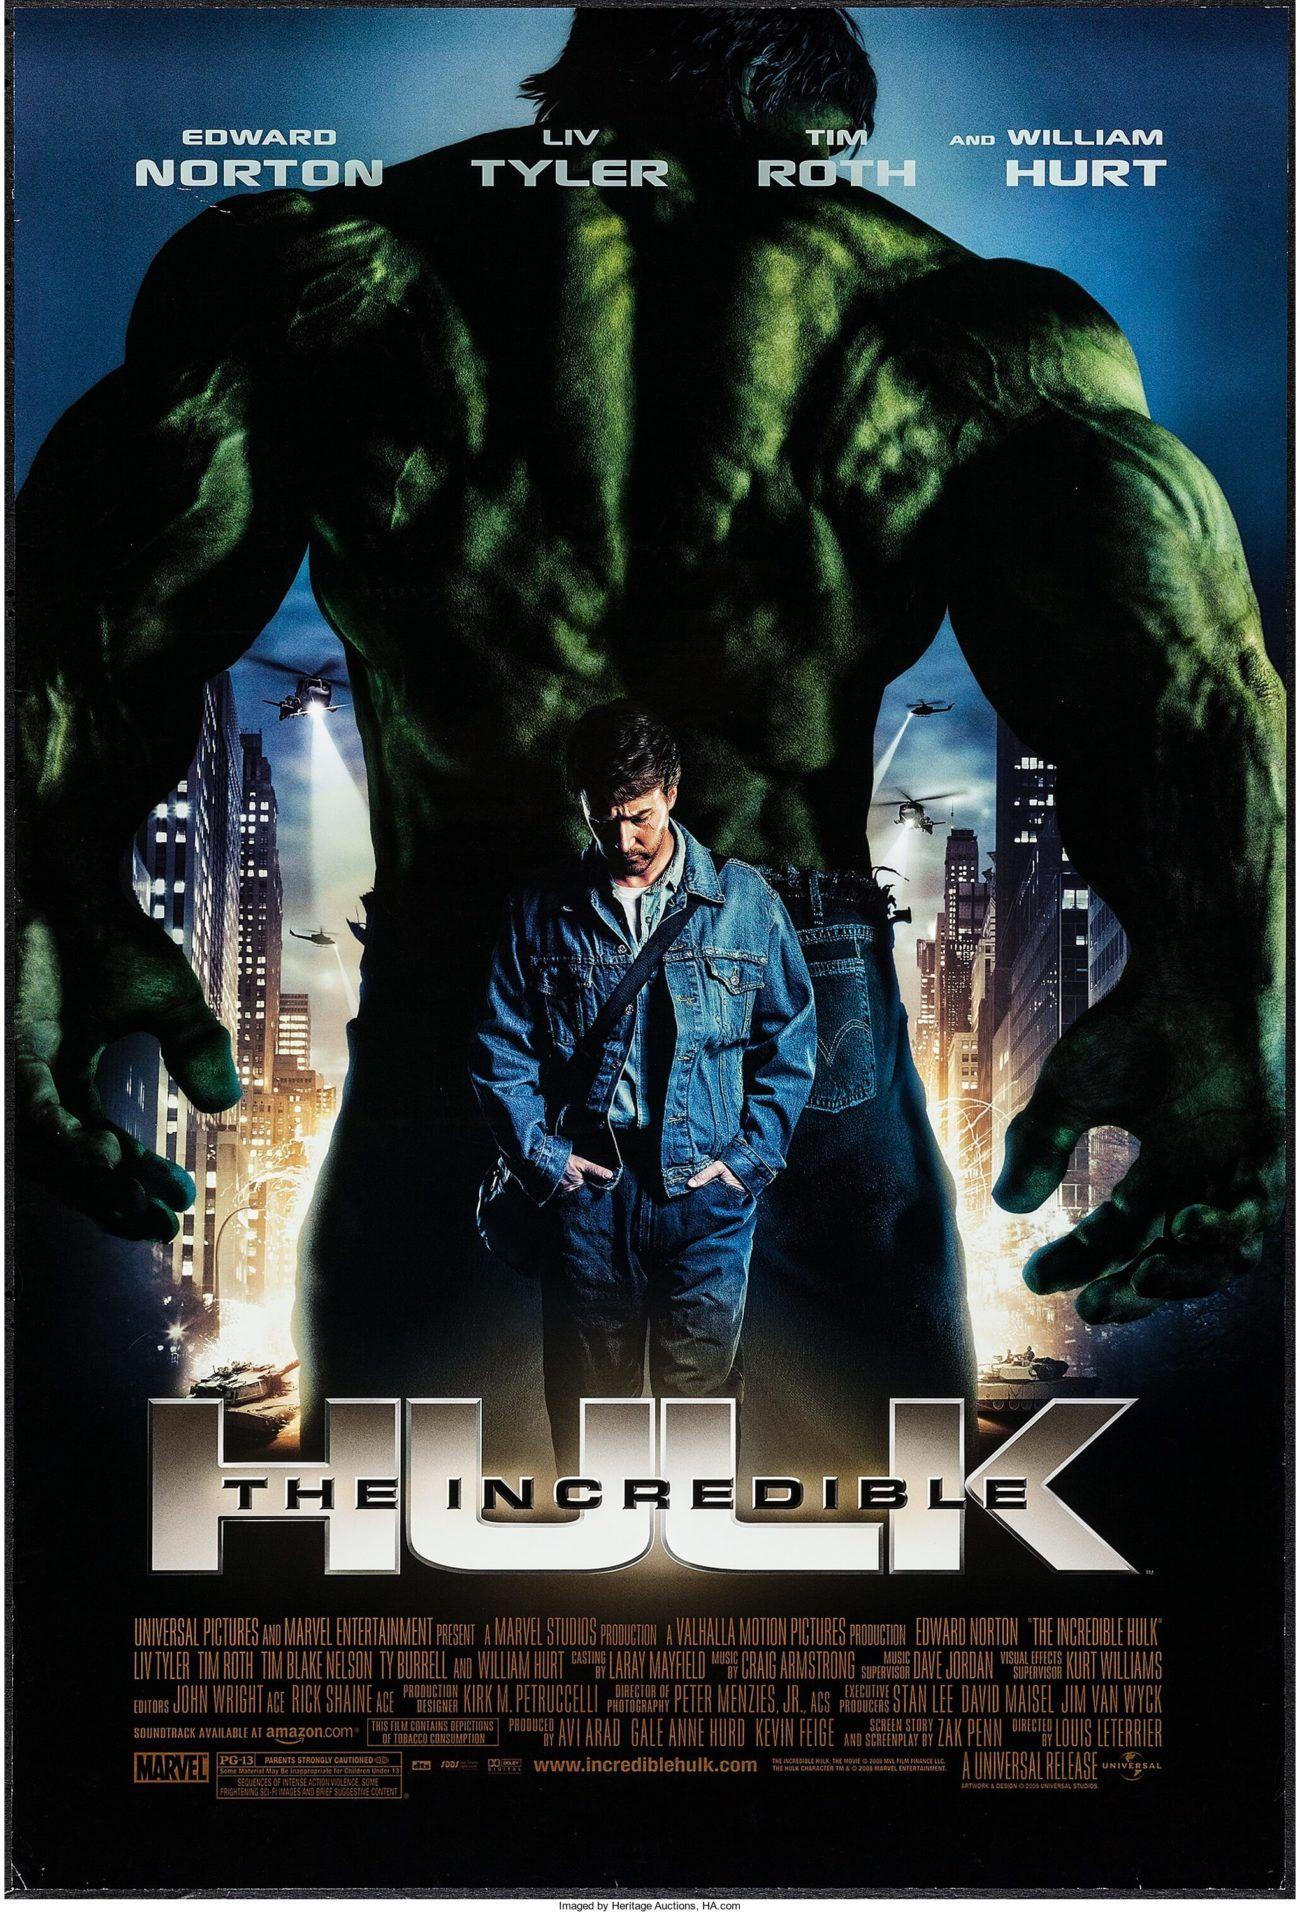 O Incrível Hulk (The Incredible Hulk), 2008.